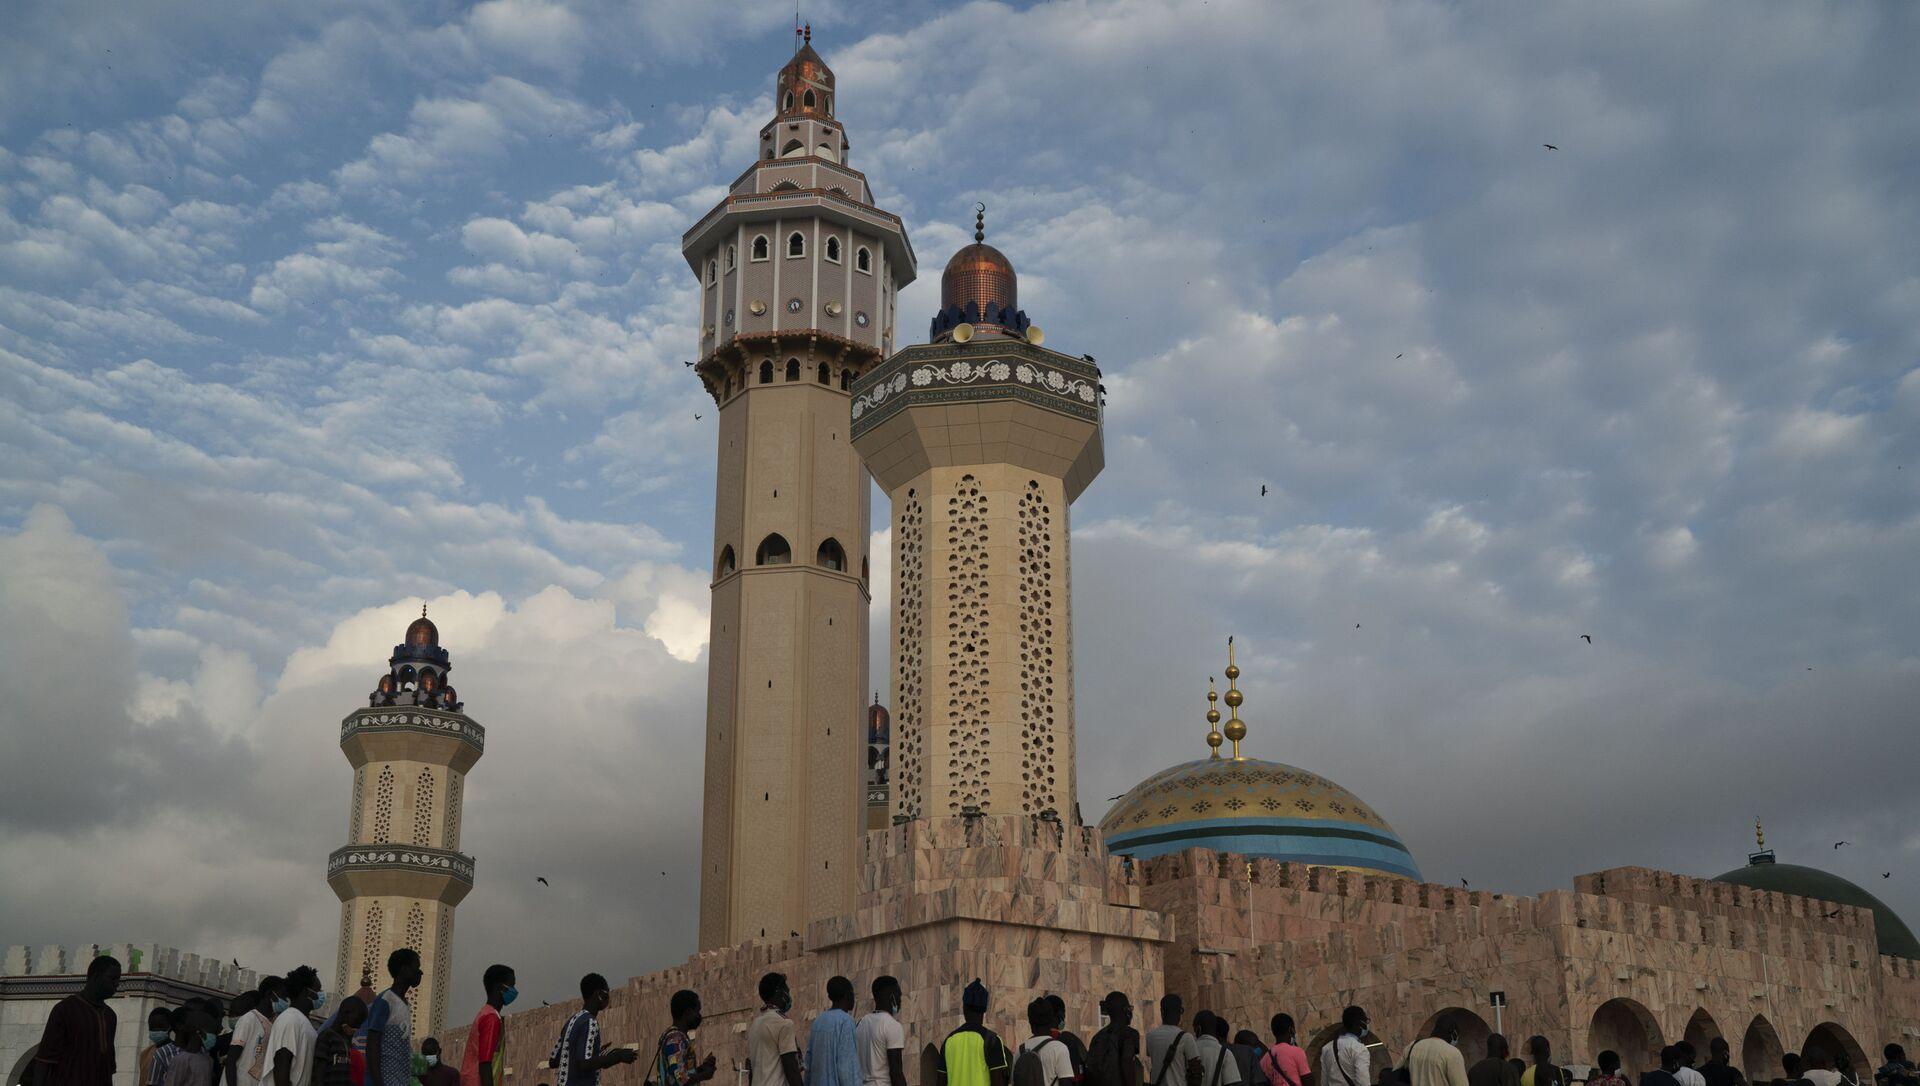 La mosquée de Touba. Sénégal. - Sputnik France, 1920, 17.08.2021